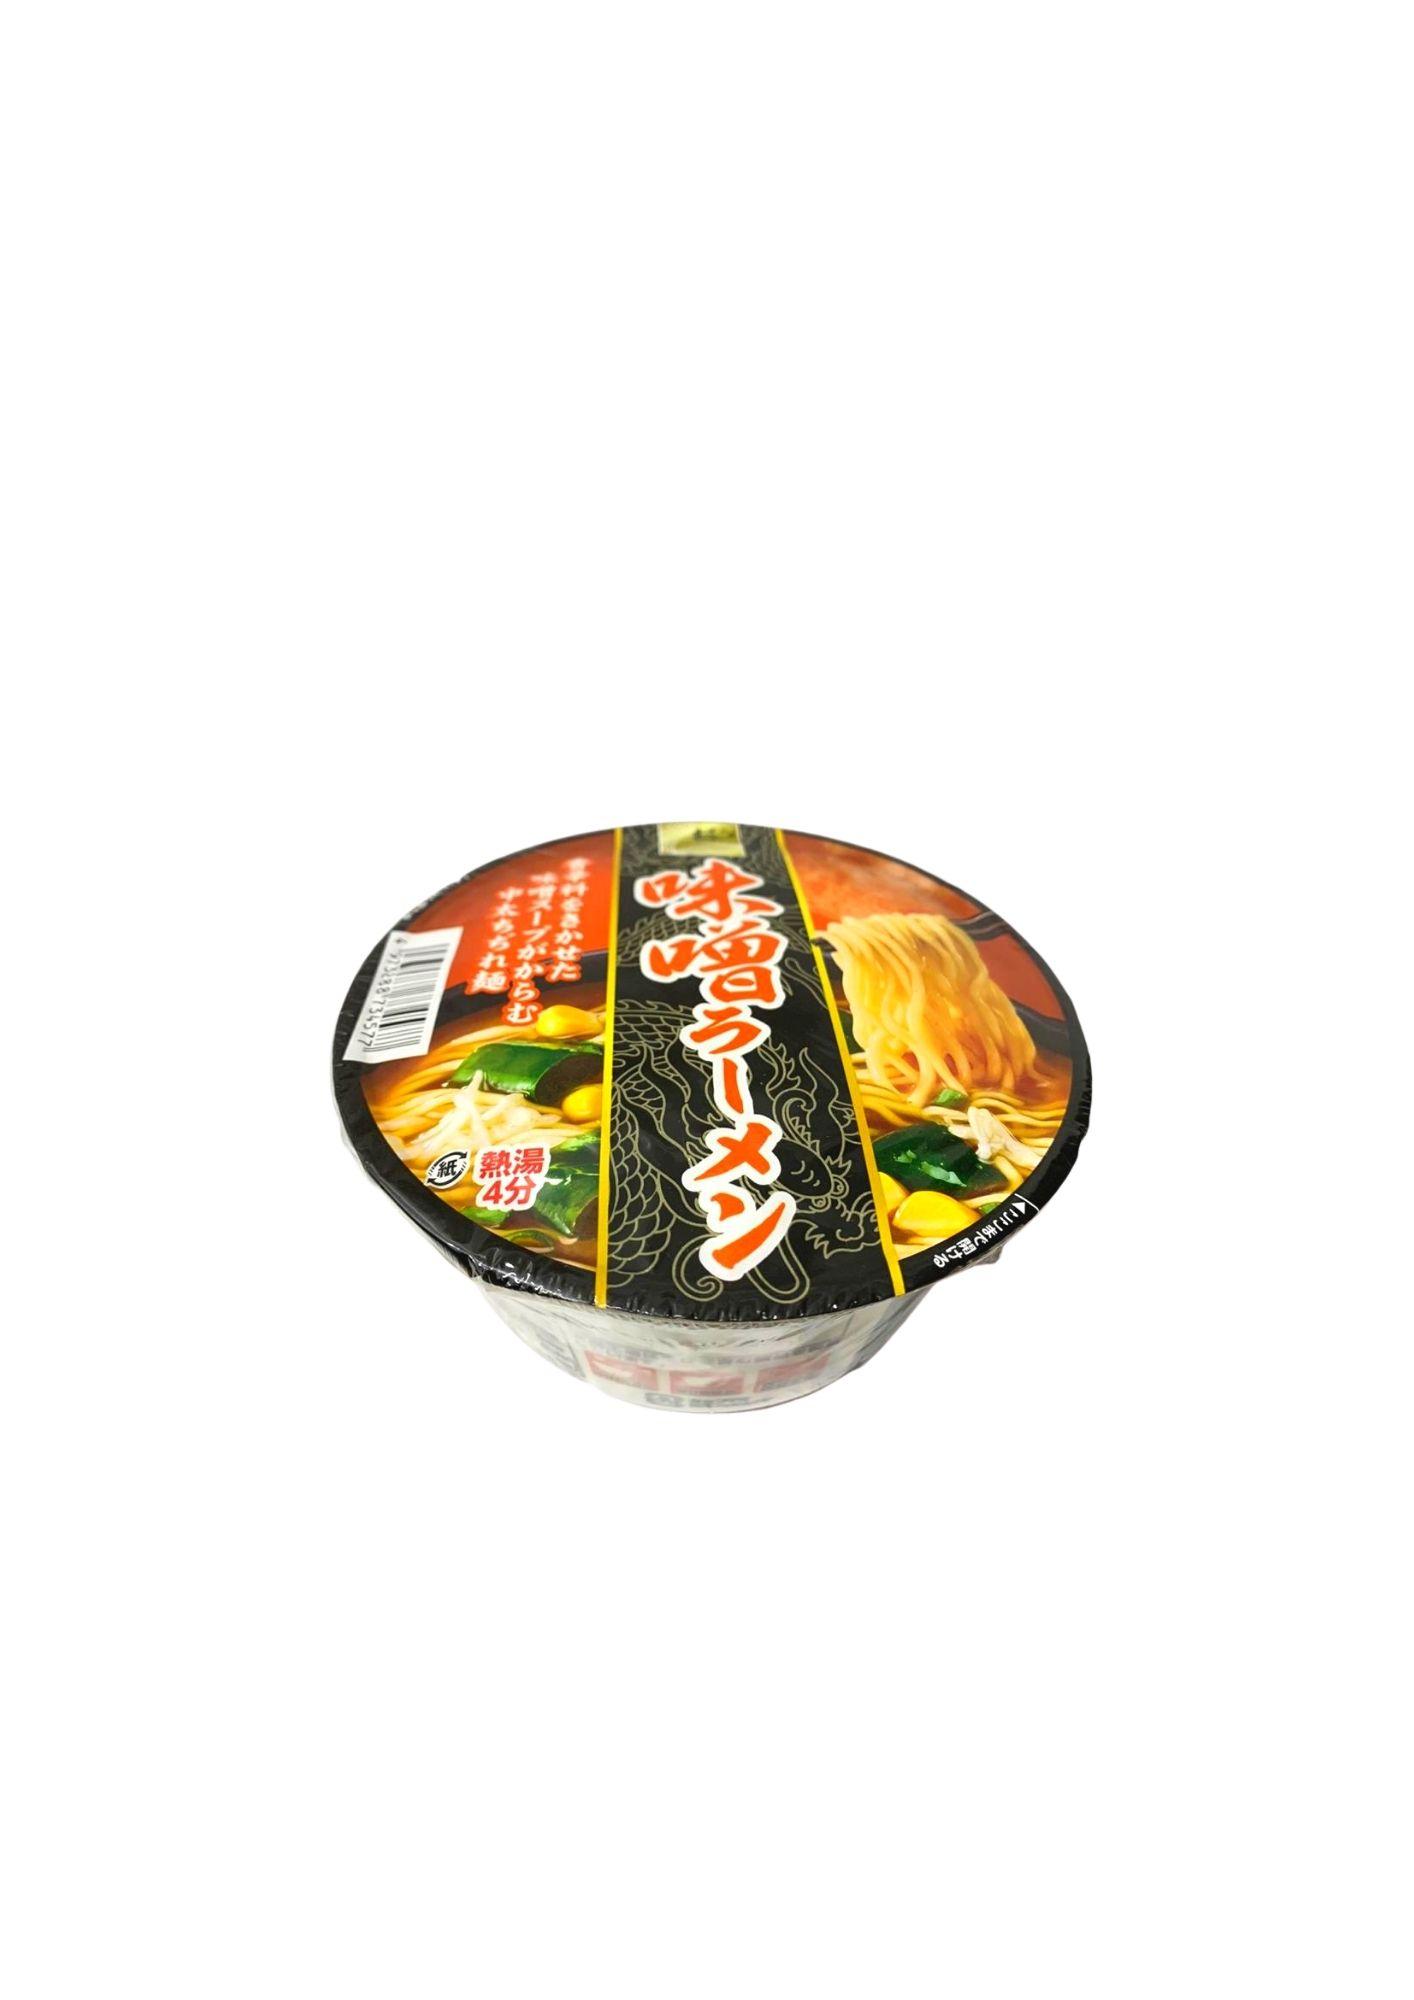 SUNAOSHI CUP MISSO LAMEN 83g